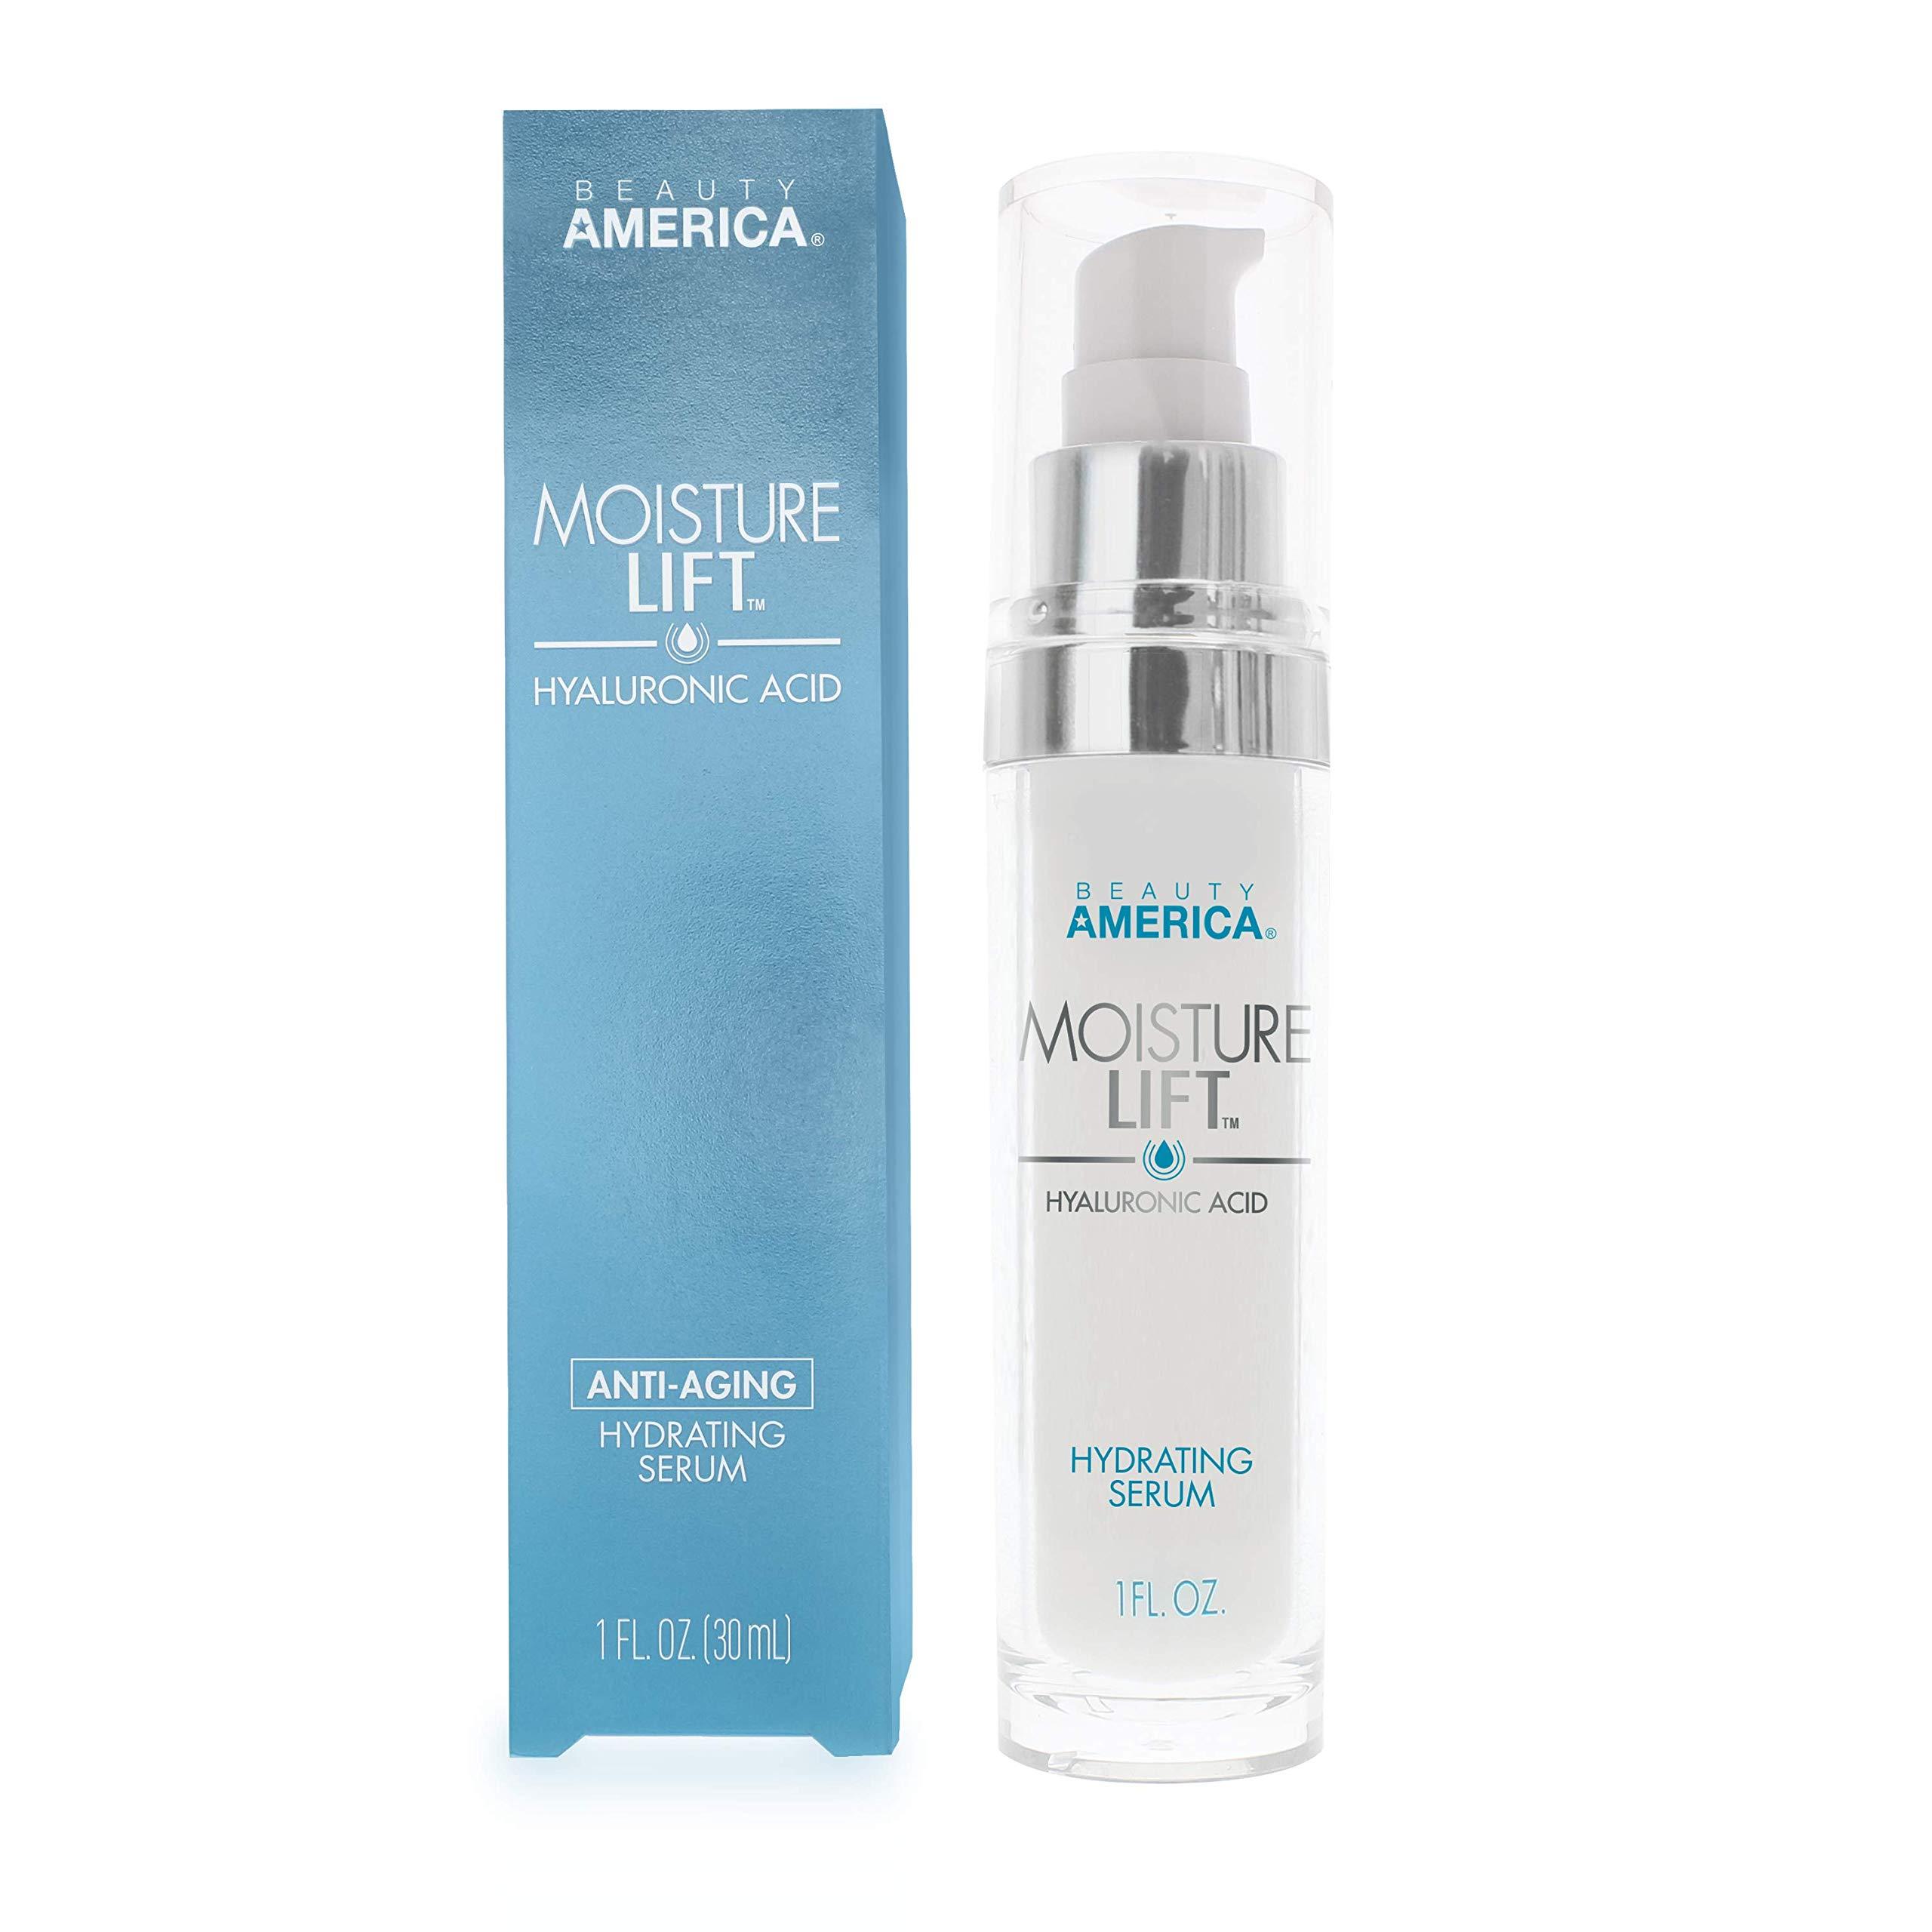 Beauty America Moisture Lift, Anti-Aging, Hyaluronic Acid, Hydrating Serum, 1 Fl Oz by Beauty America